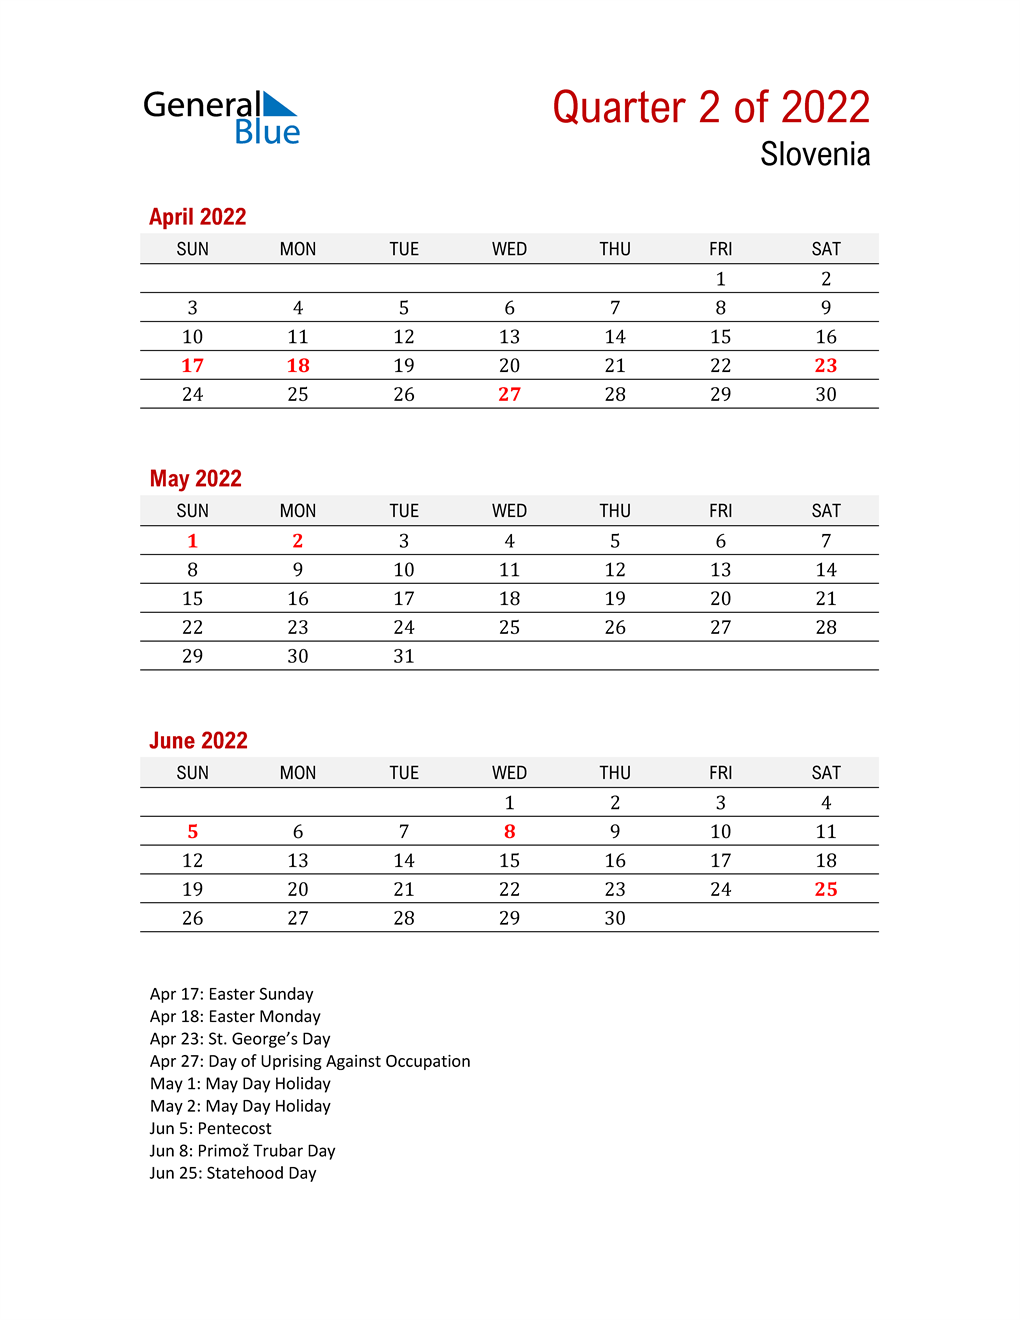 Printable Three Month Calendar for Slovenia